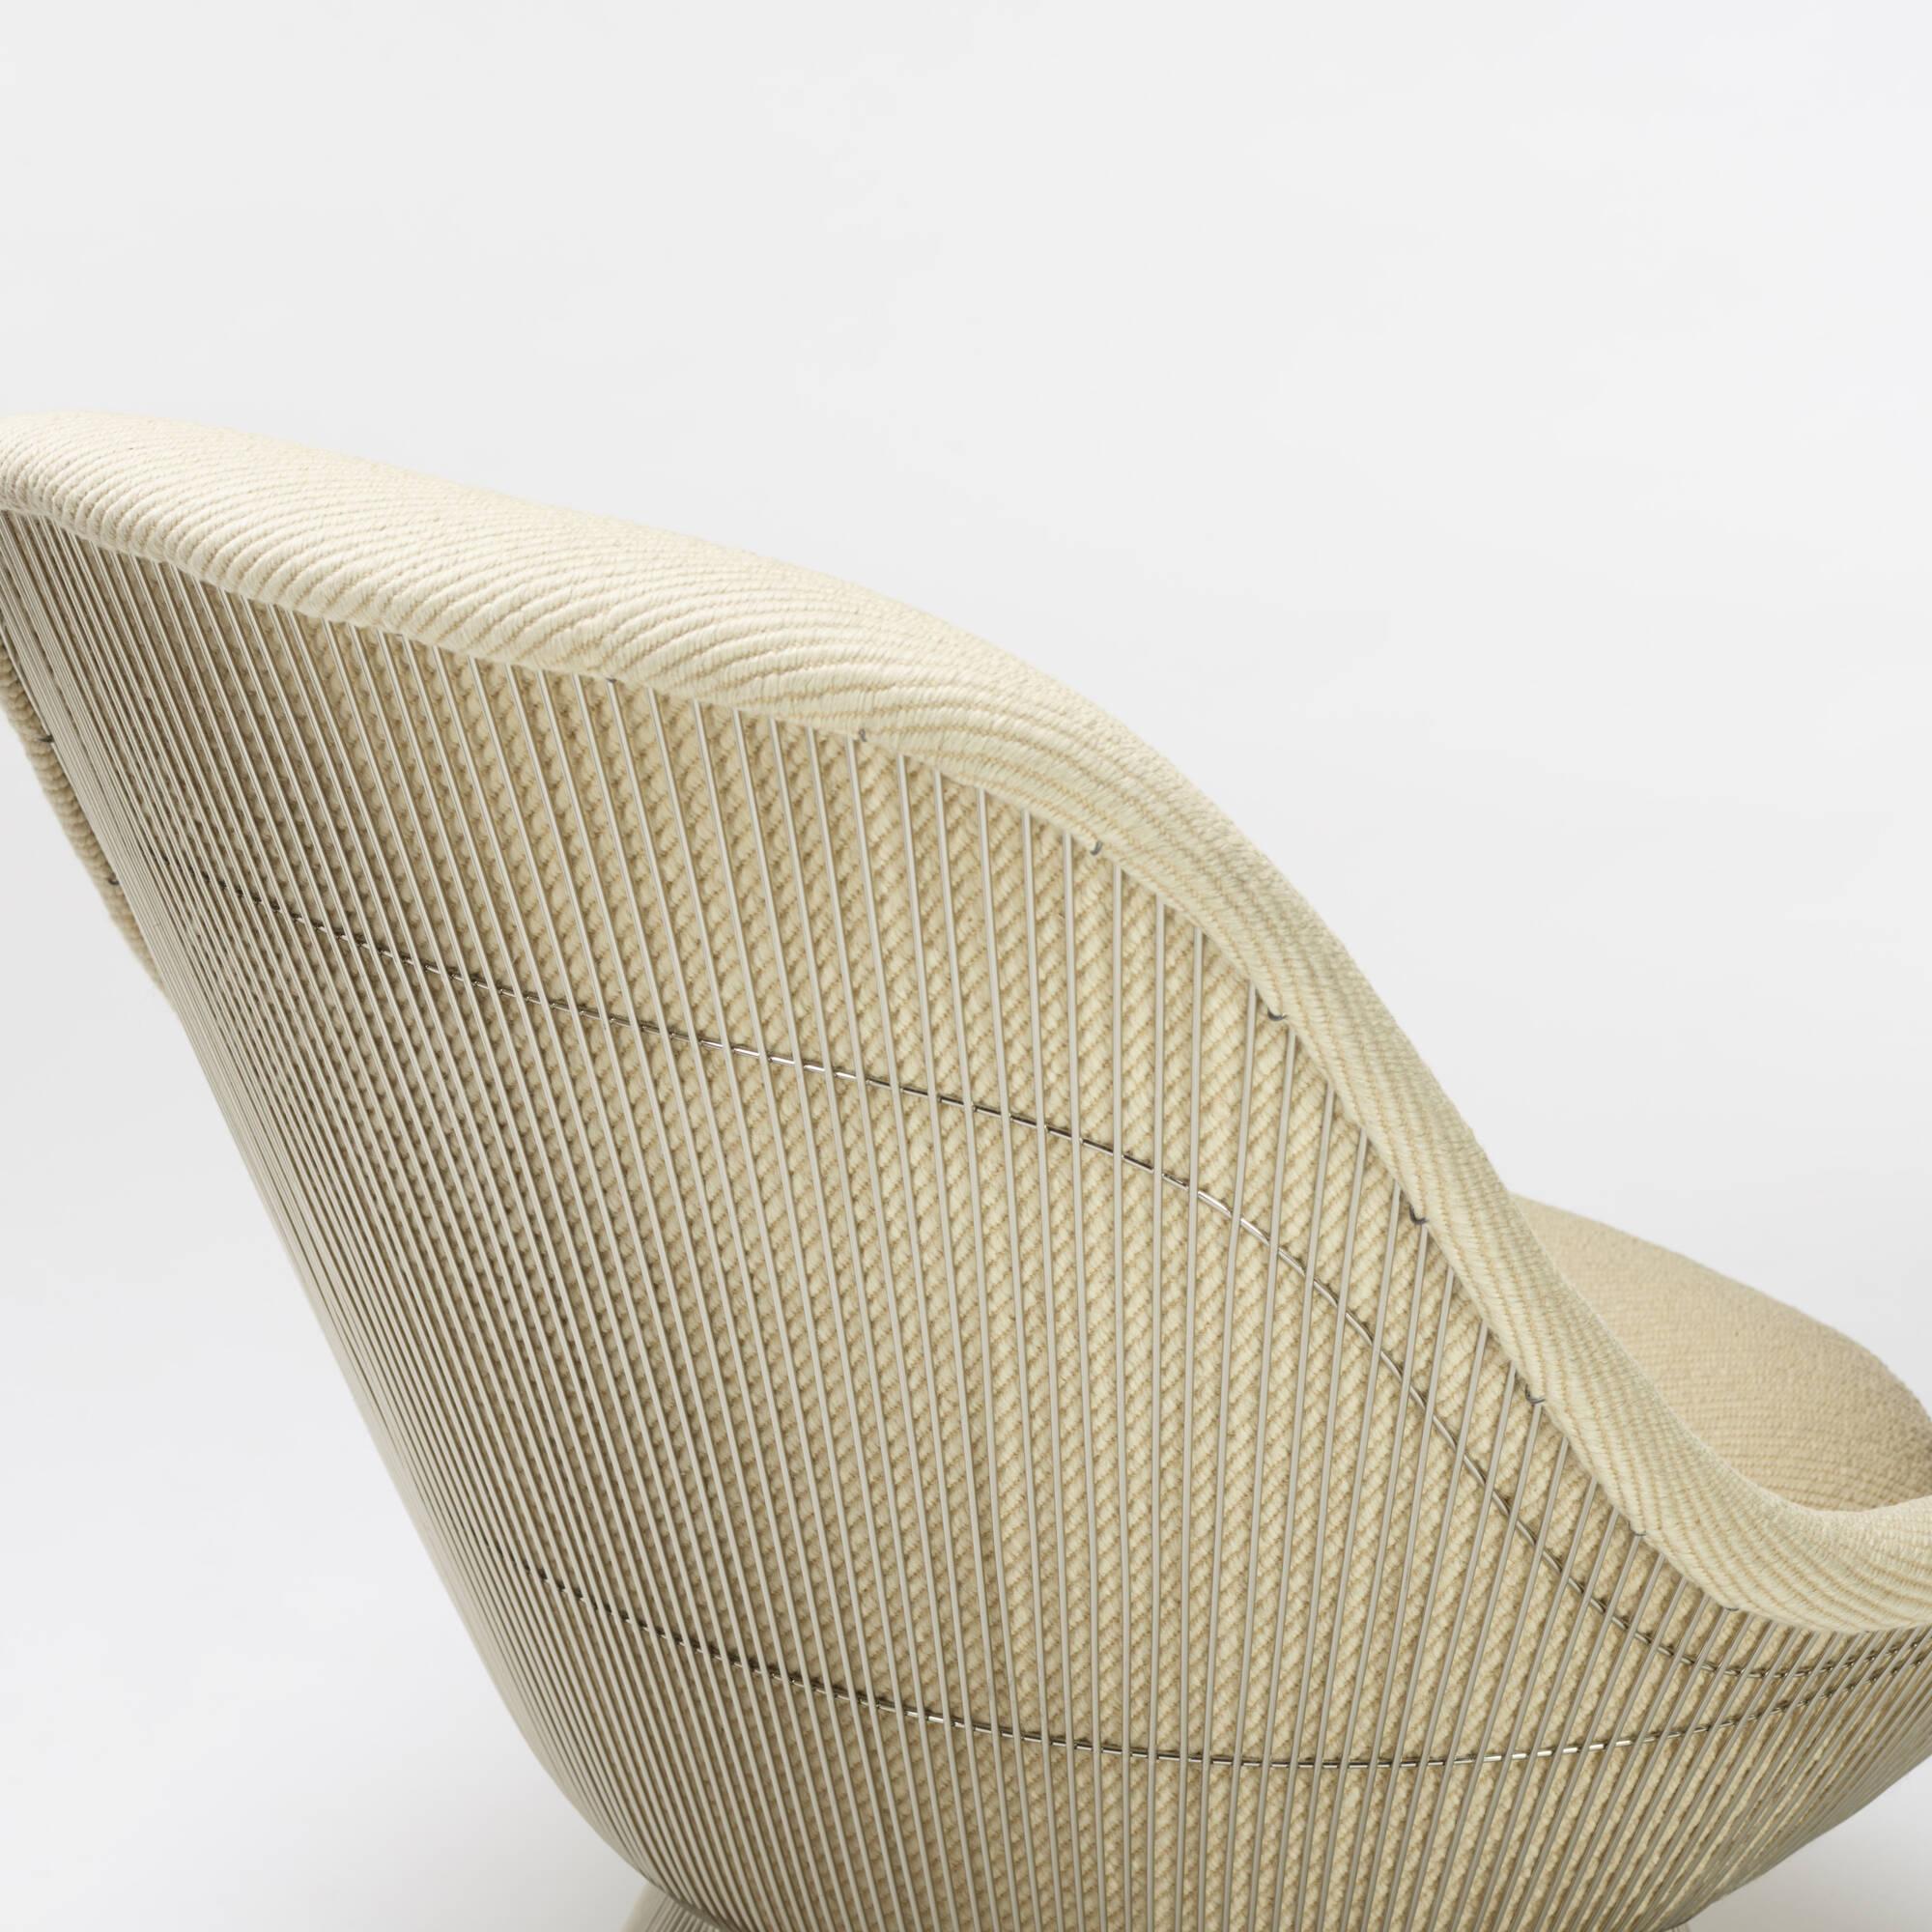 296: Warren Platner / lounge chairs, pair (4 of 4)